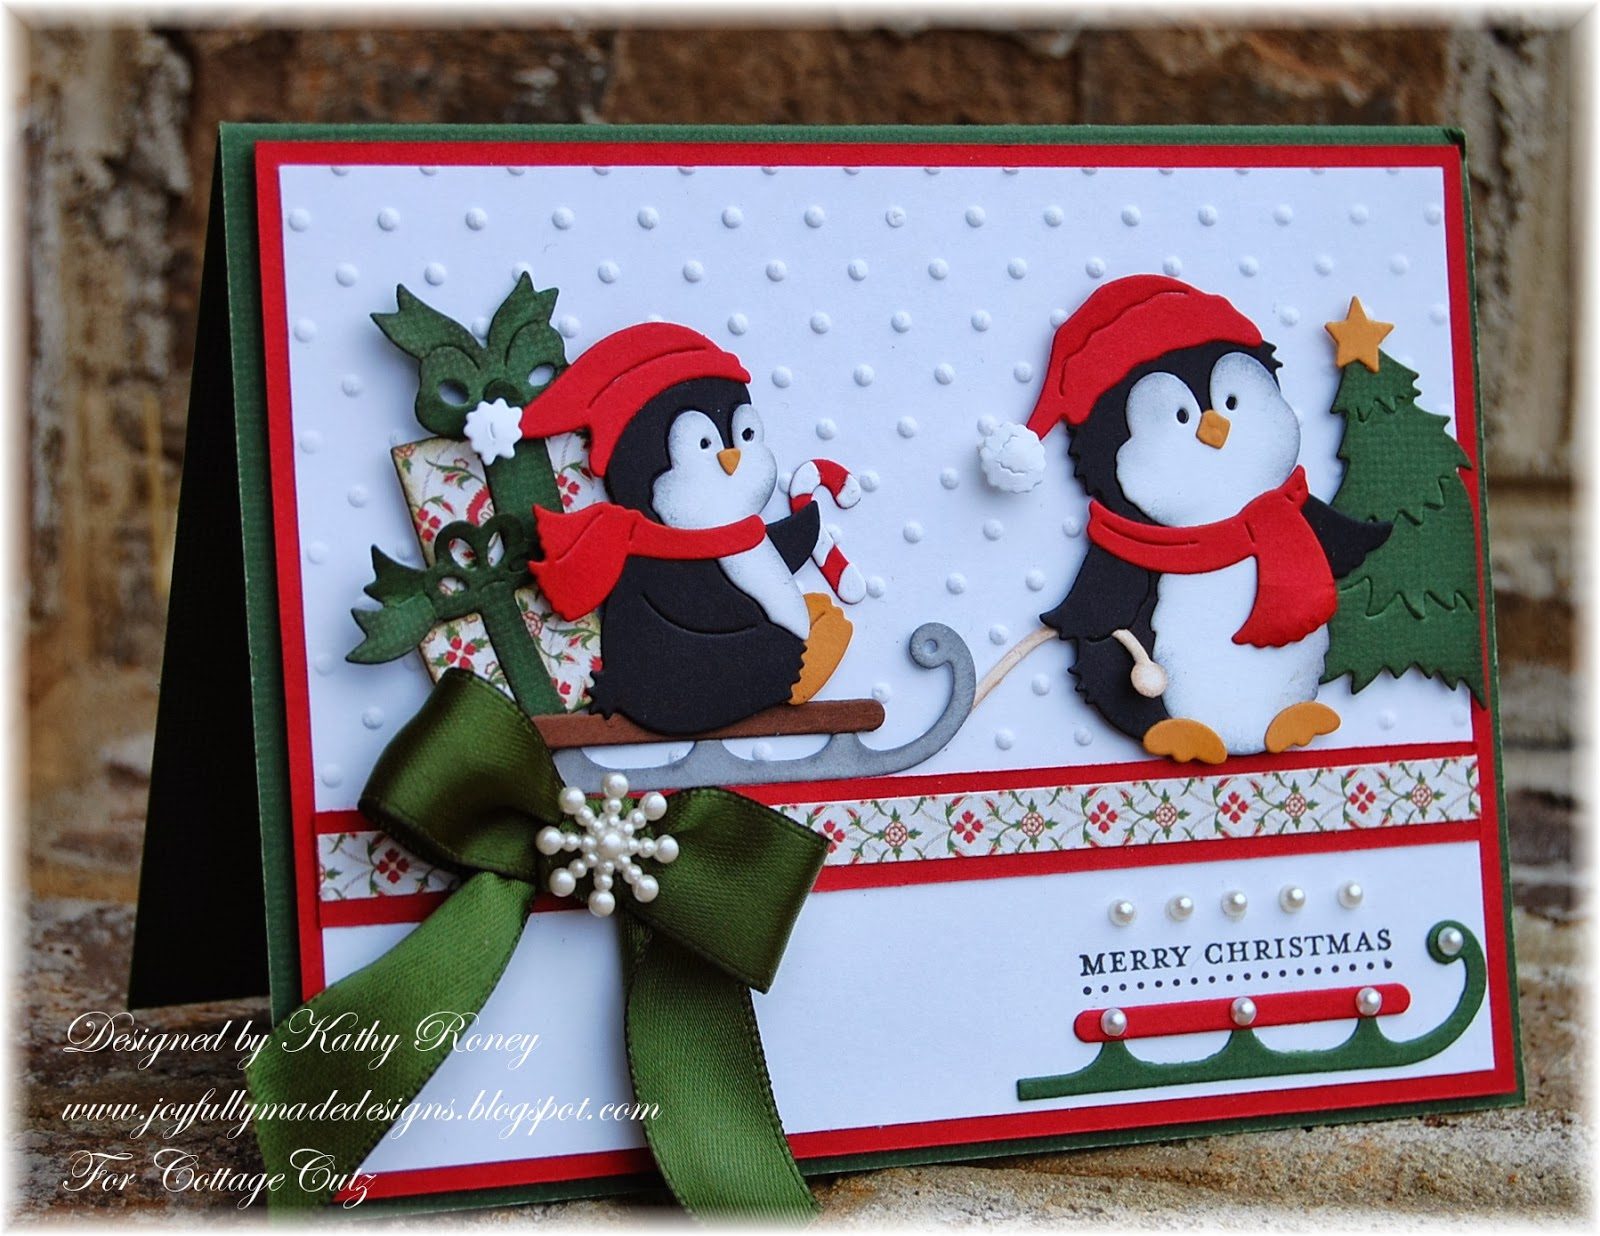 Joyfully Made Designs Jolly Penguin